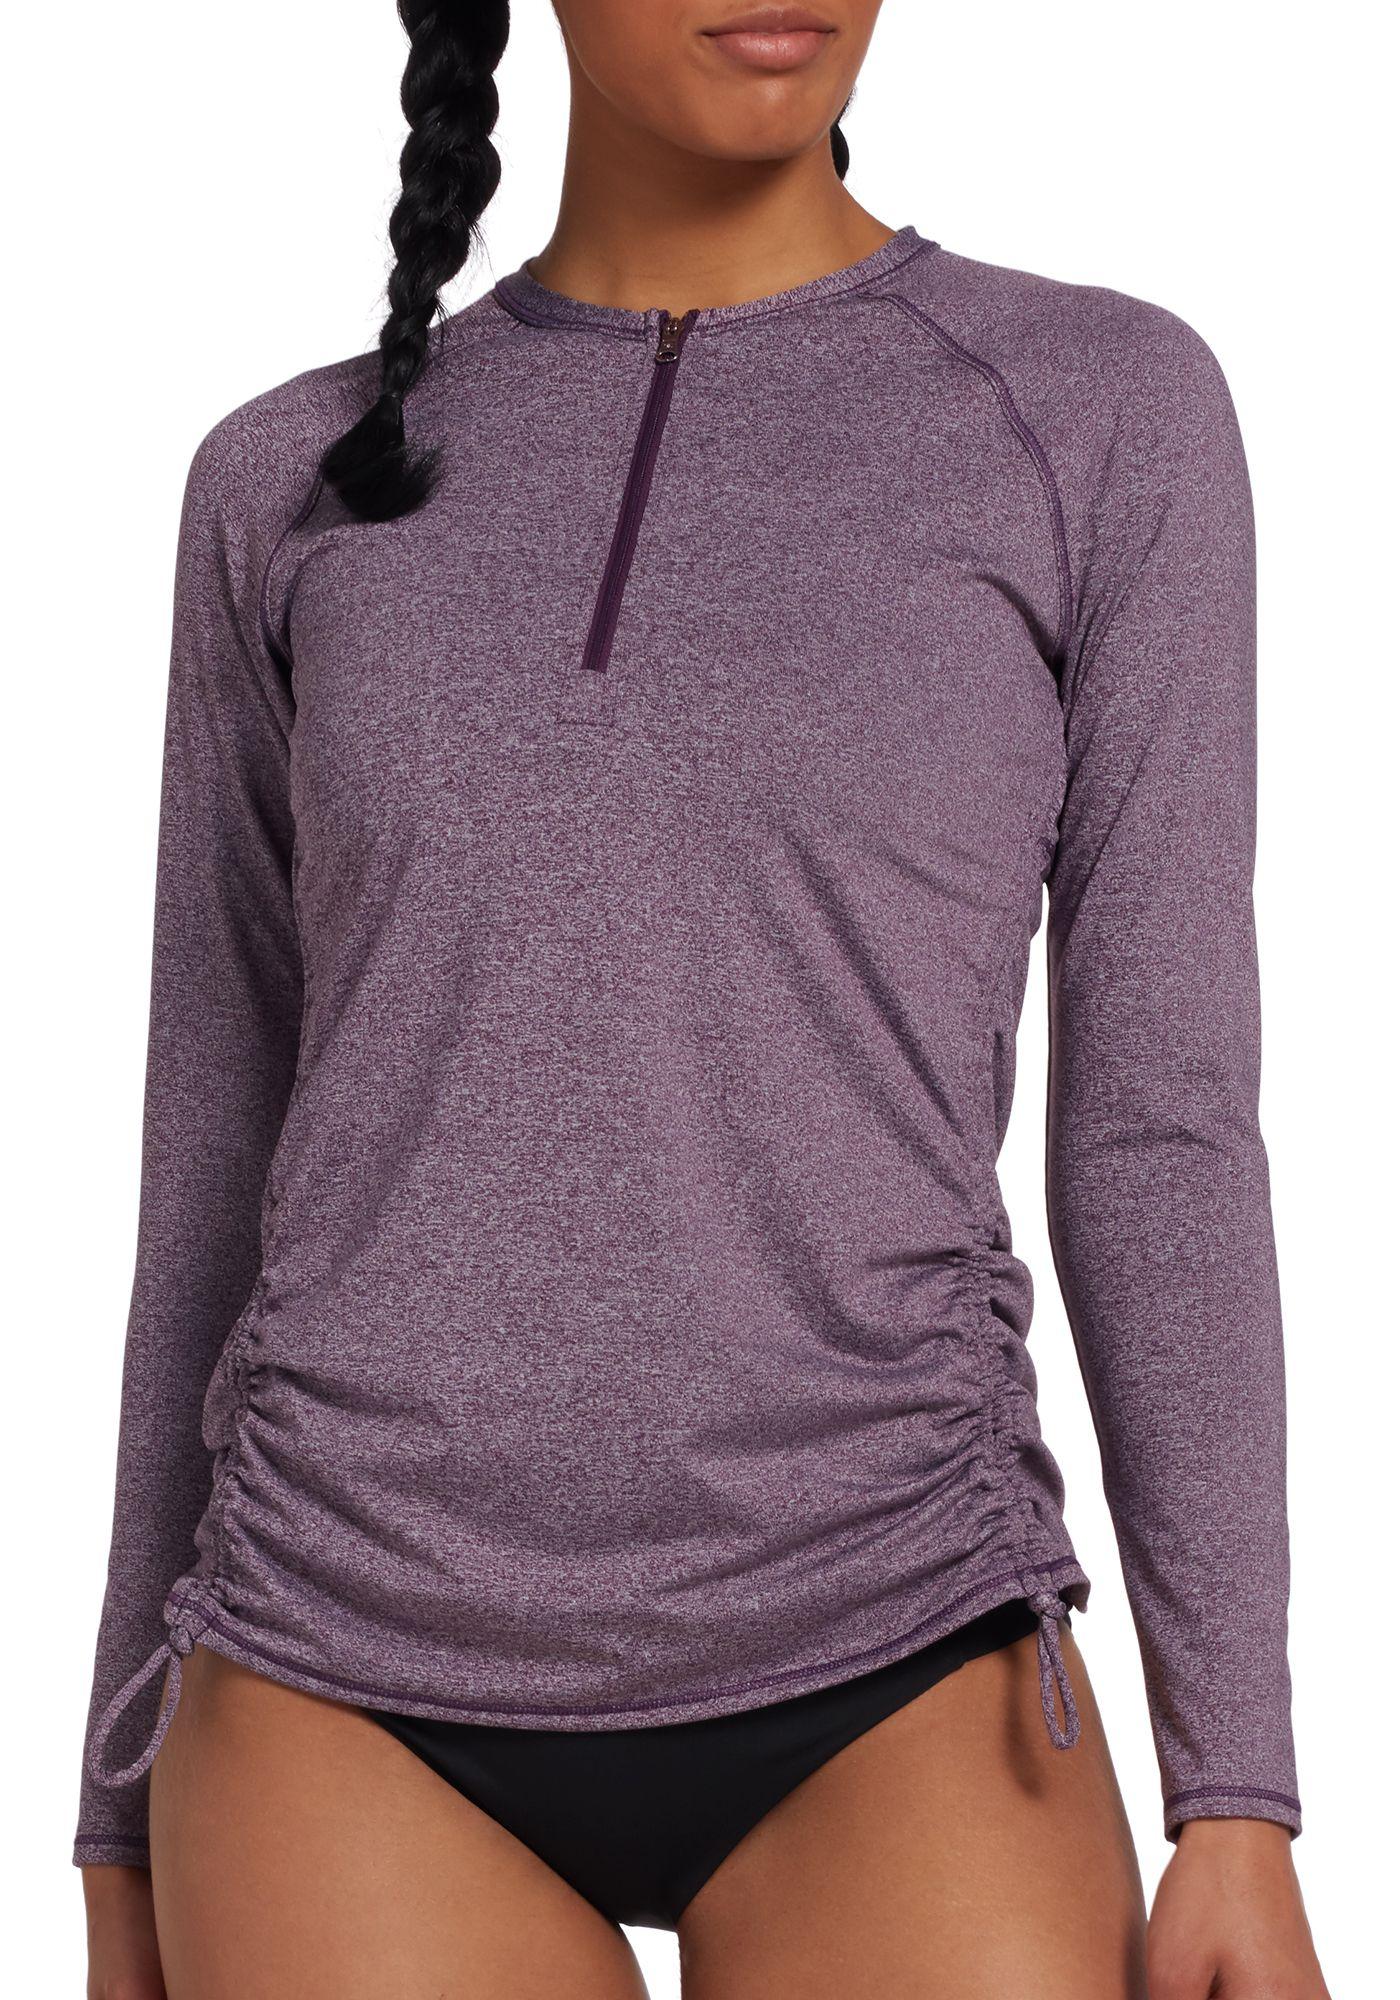 CALIA by Carrie Underwood Women's Zip Up Long Sleeve Rash Guard